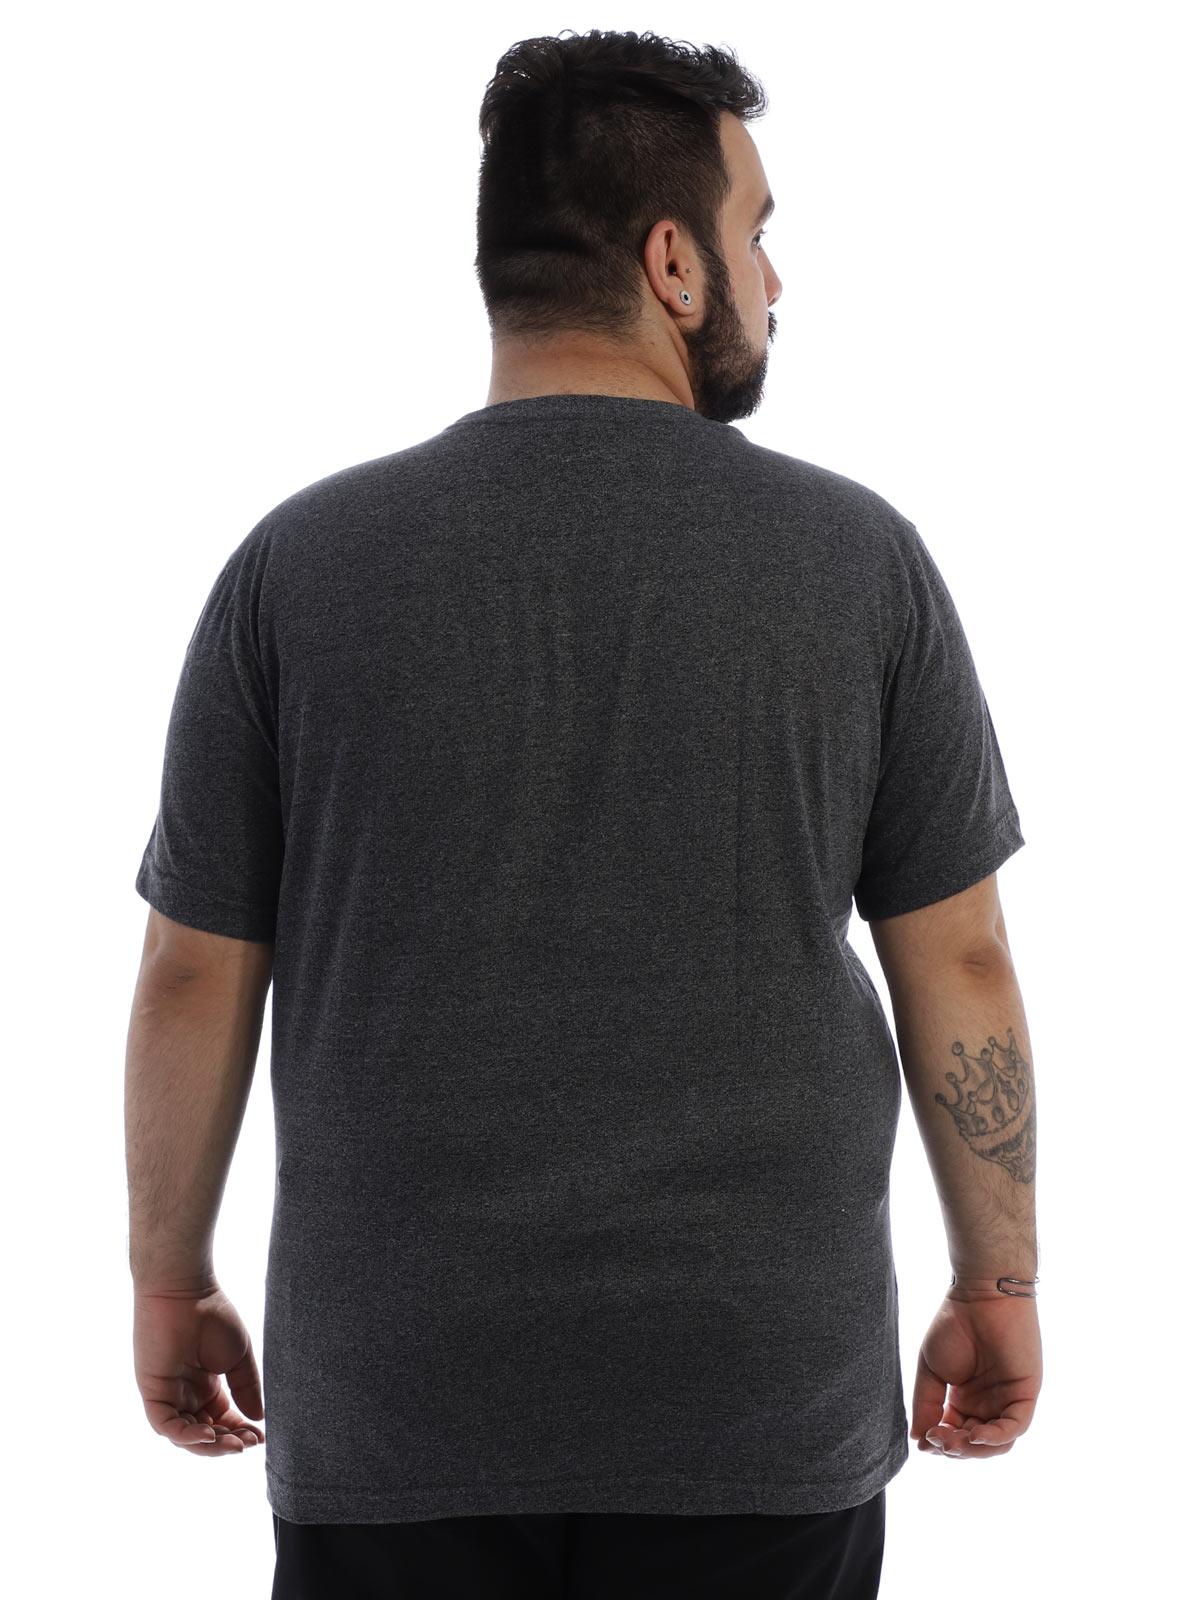 Camiseta Plus Size Masculina Algodão Mouline Nature Preto